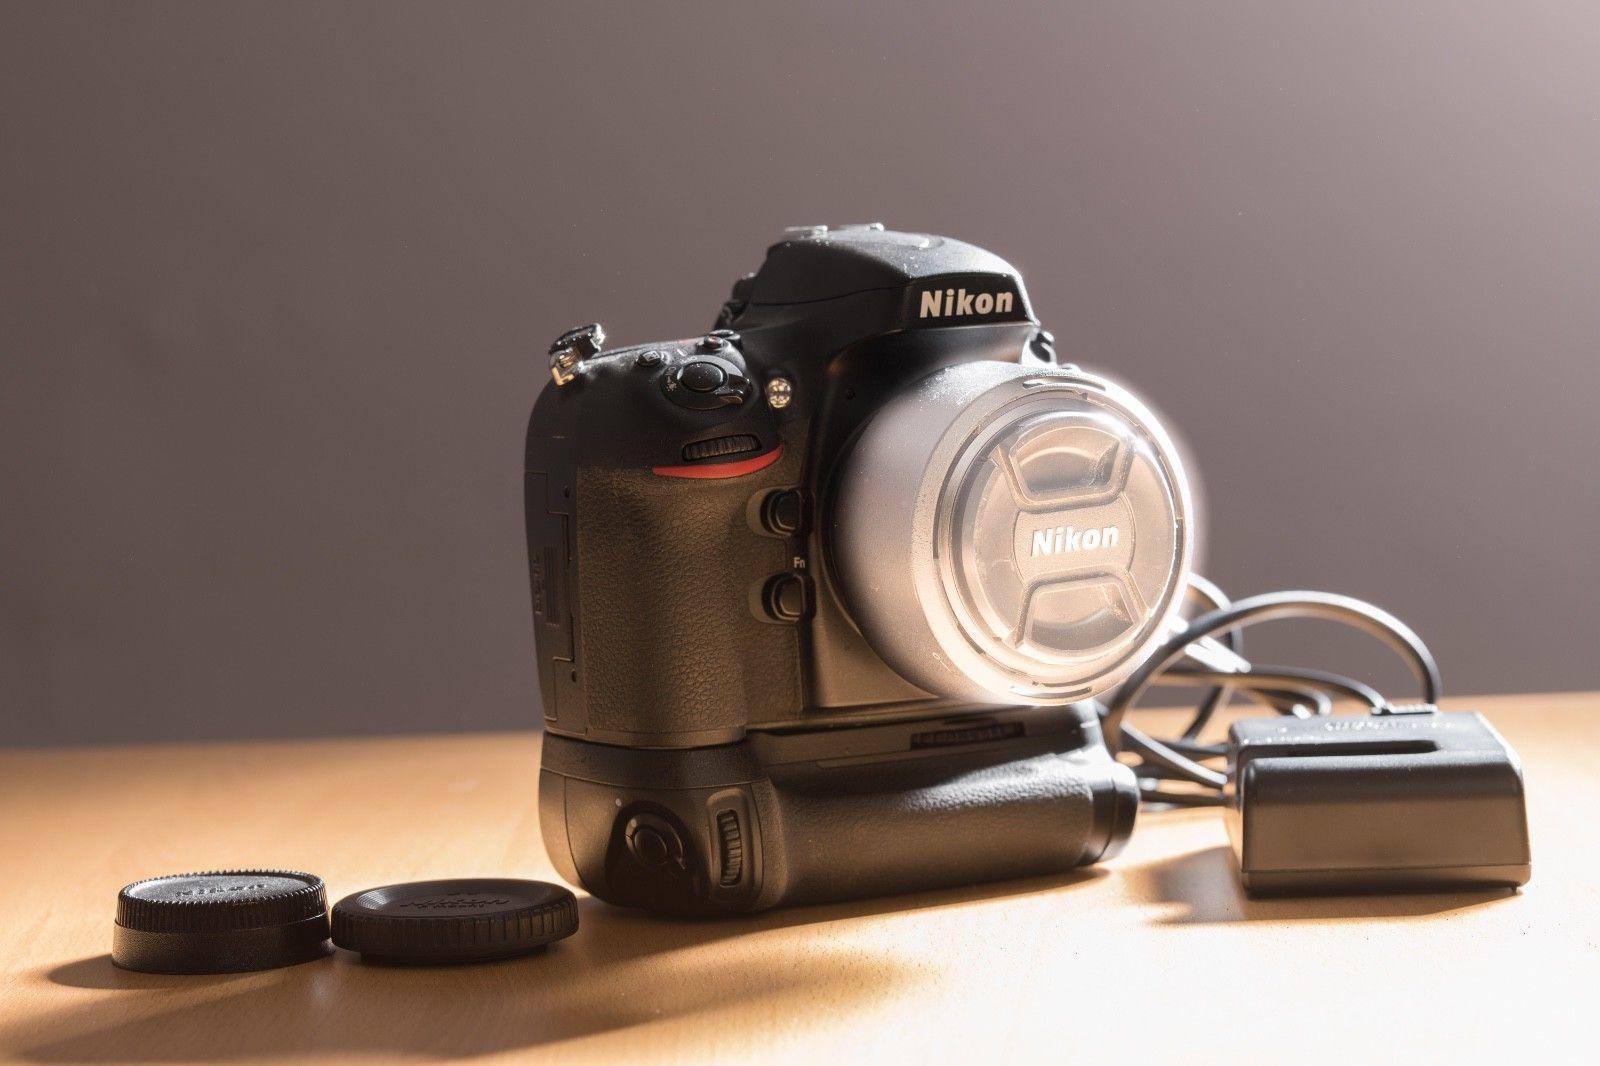 Nikon D800 Body mit Original Nikon Handgriff